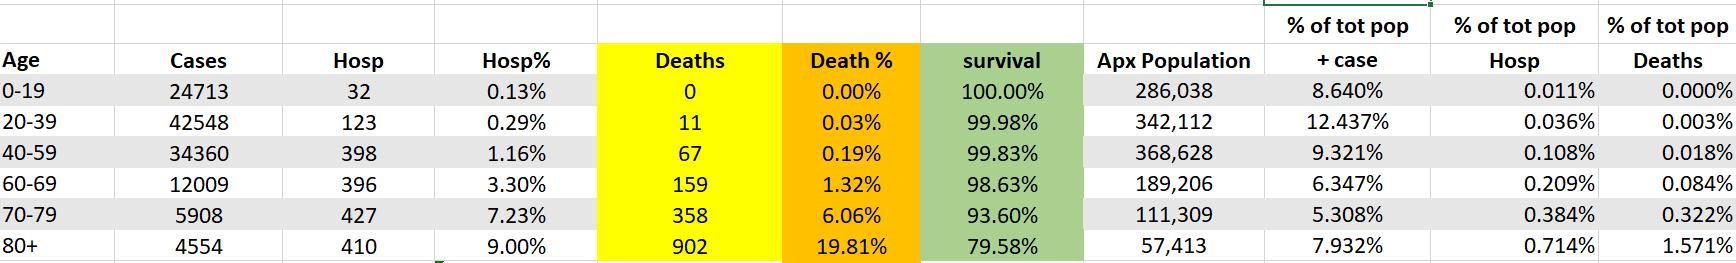 NH Covid data chart 10-9-21